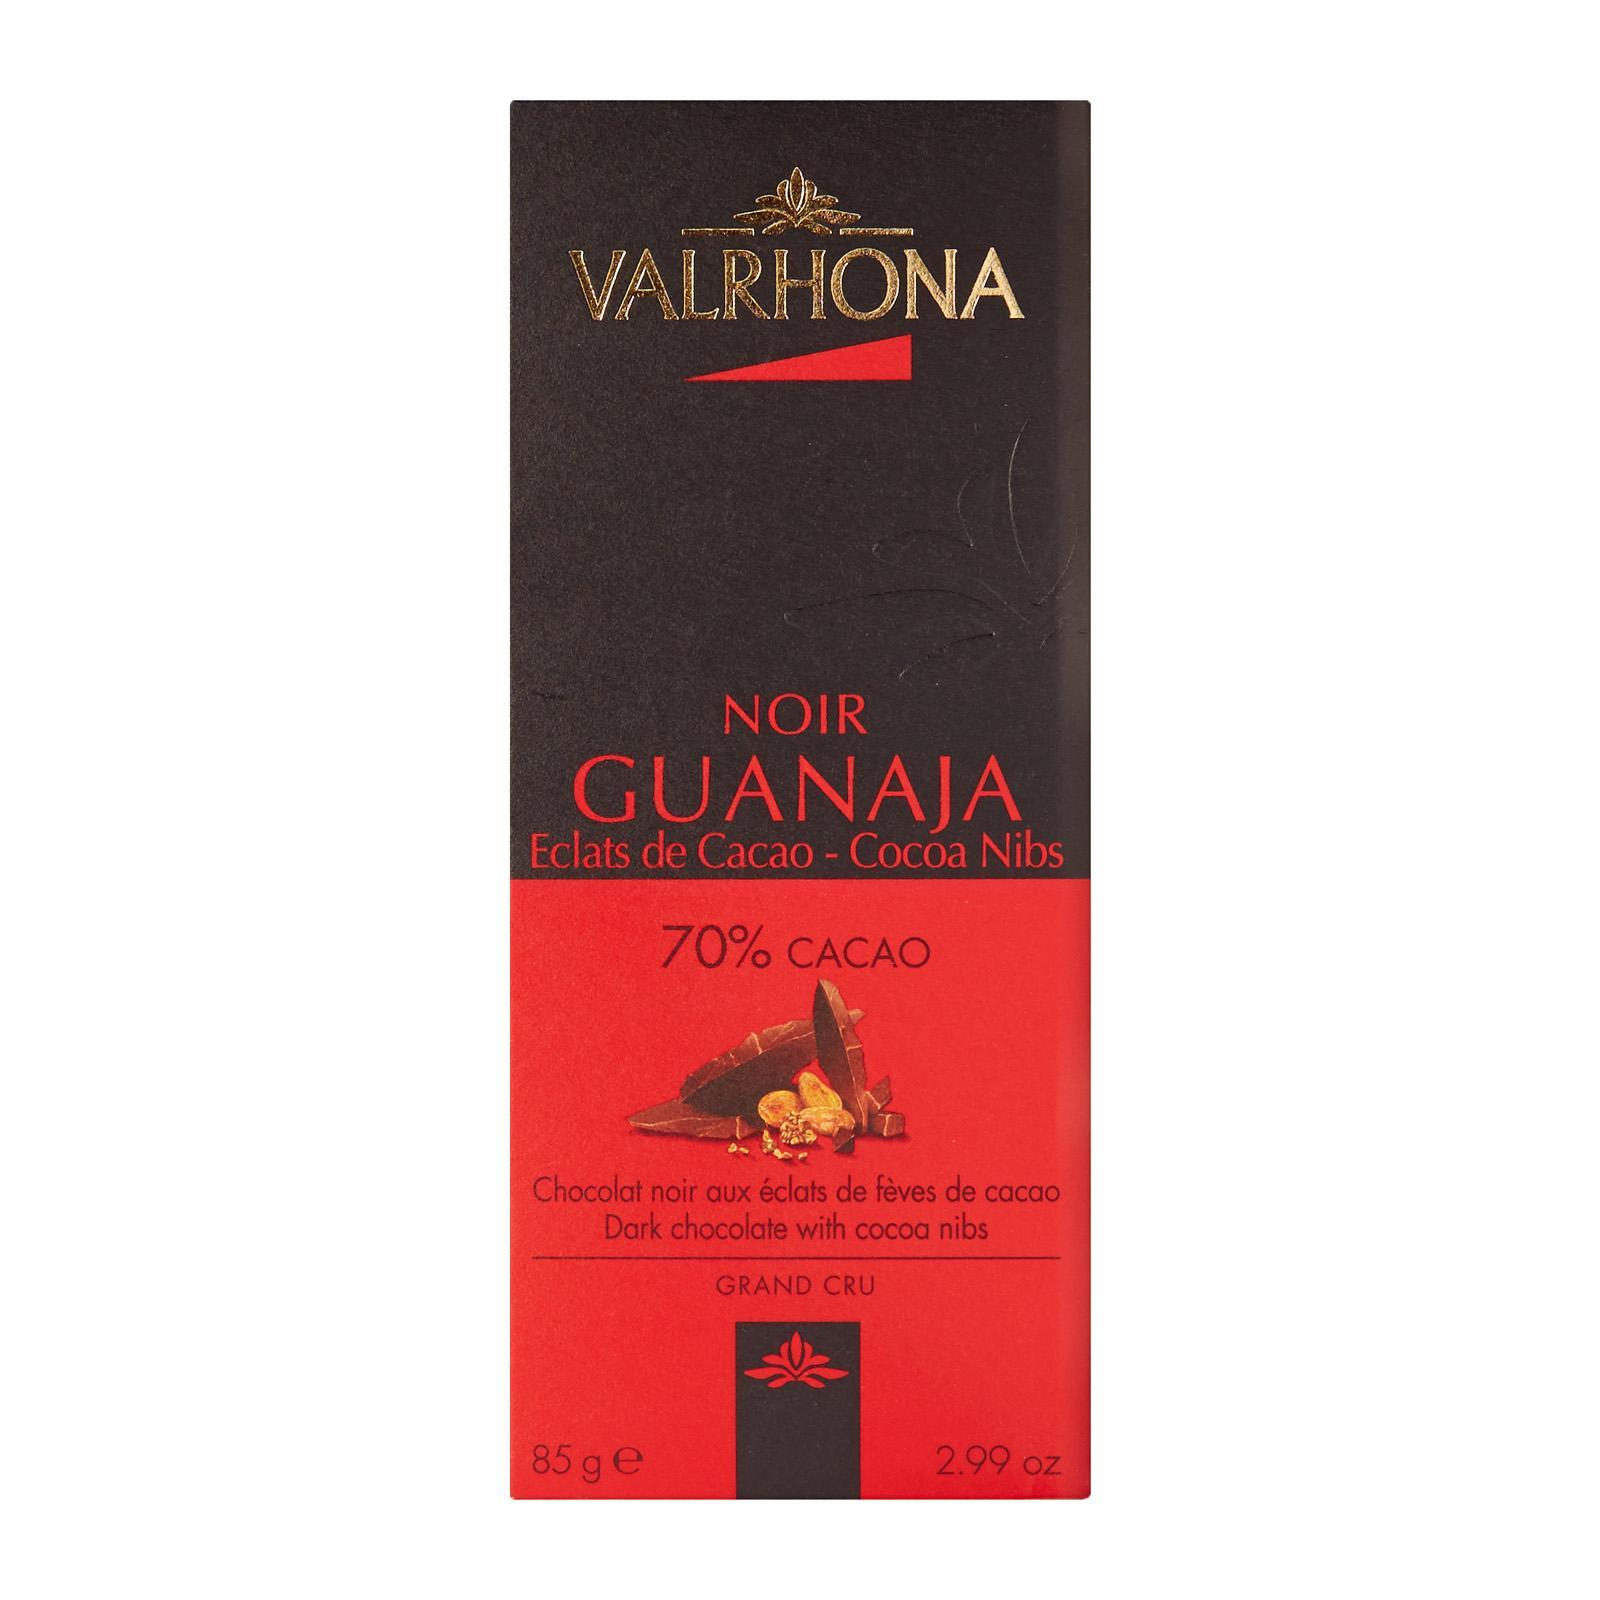 Valrhona Dark Guanaja 70% W/Cocoa Nib Gourmet Chocolate Bar